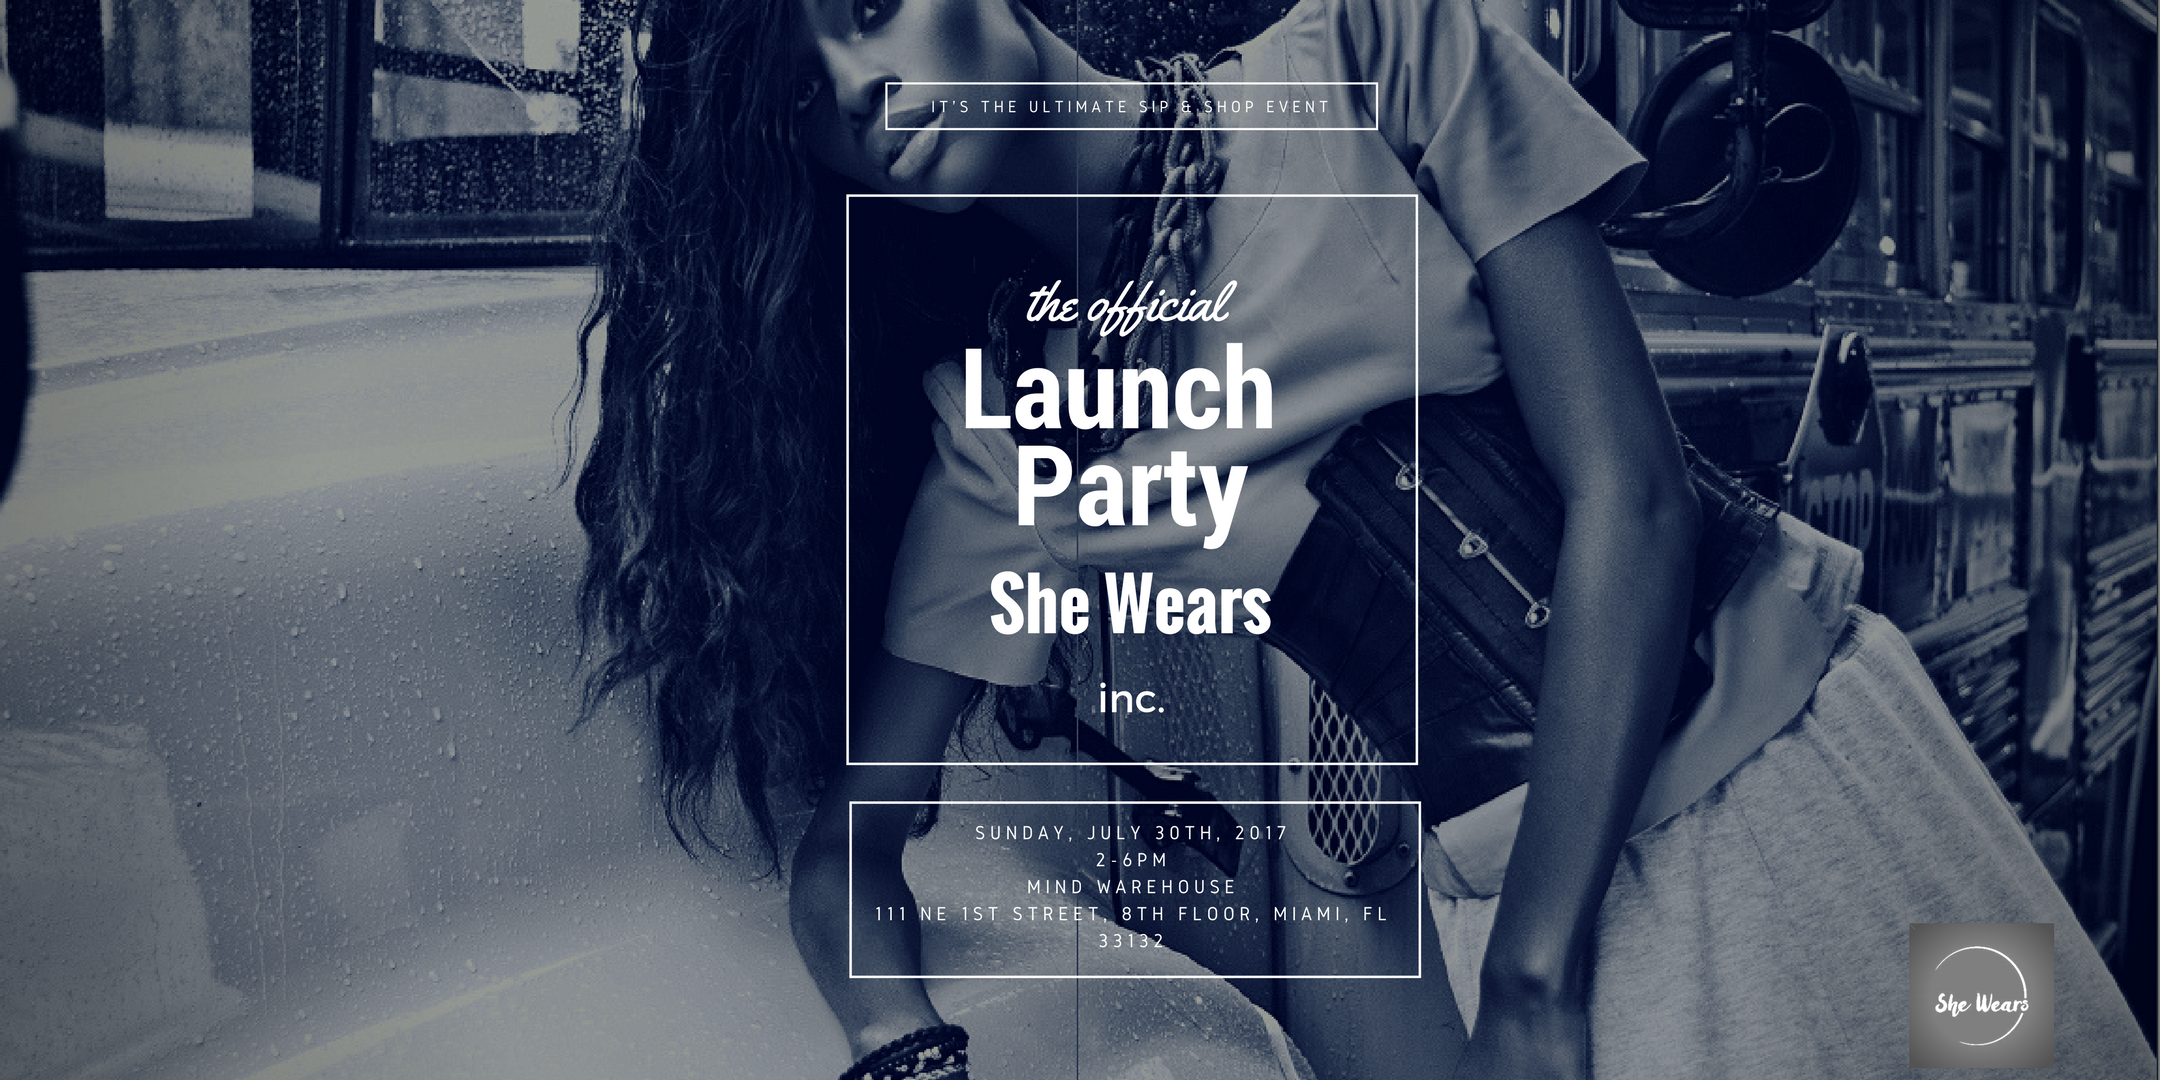 She Wears, Inc. Launch Party. She Wears, Inc. Launch Party